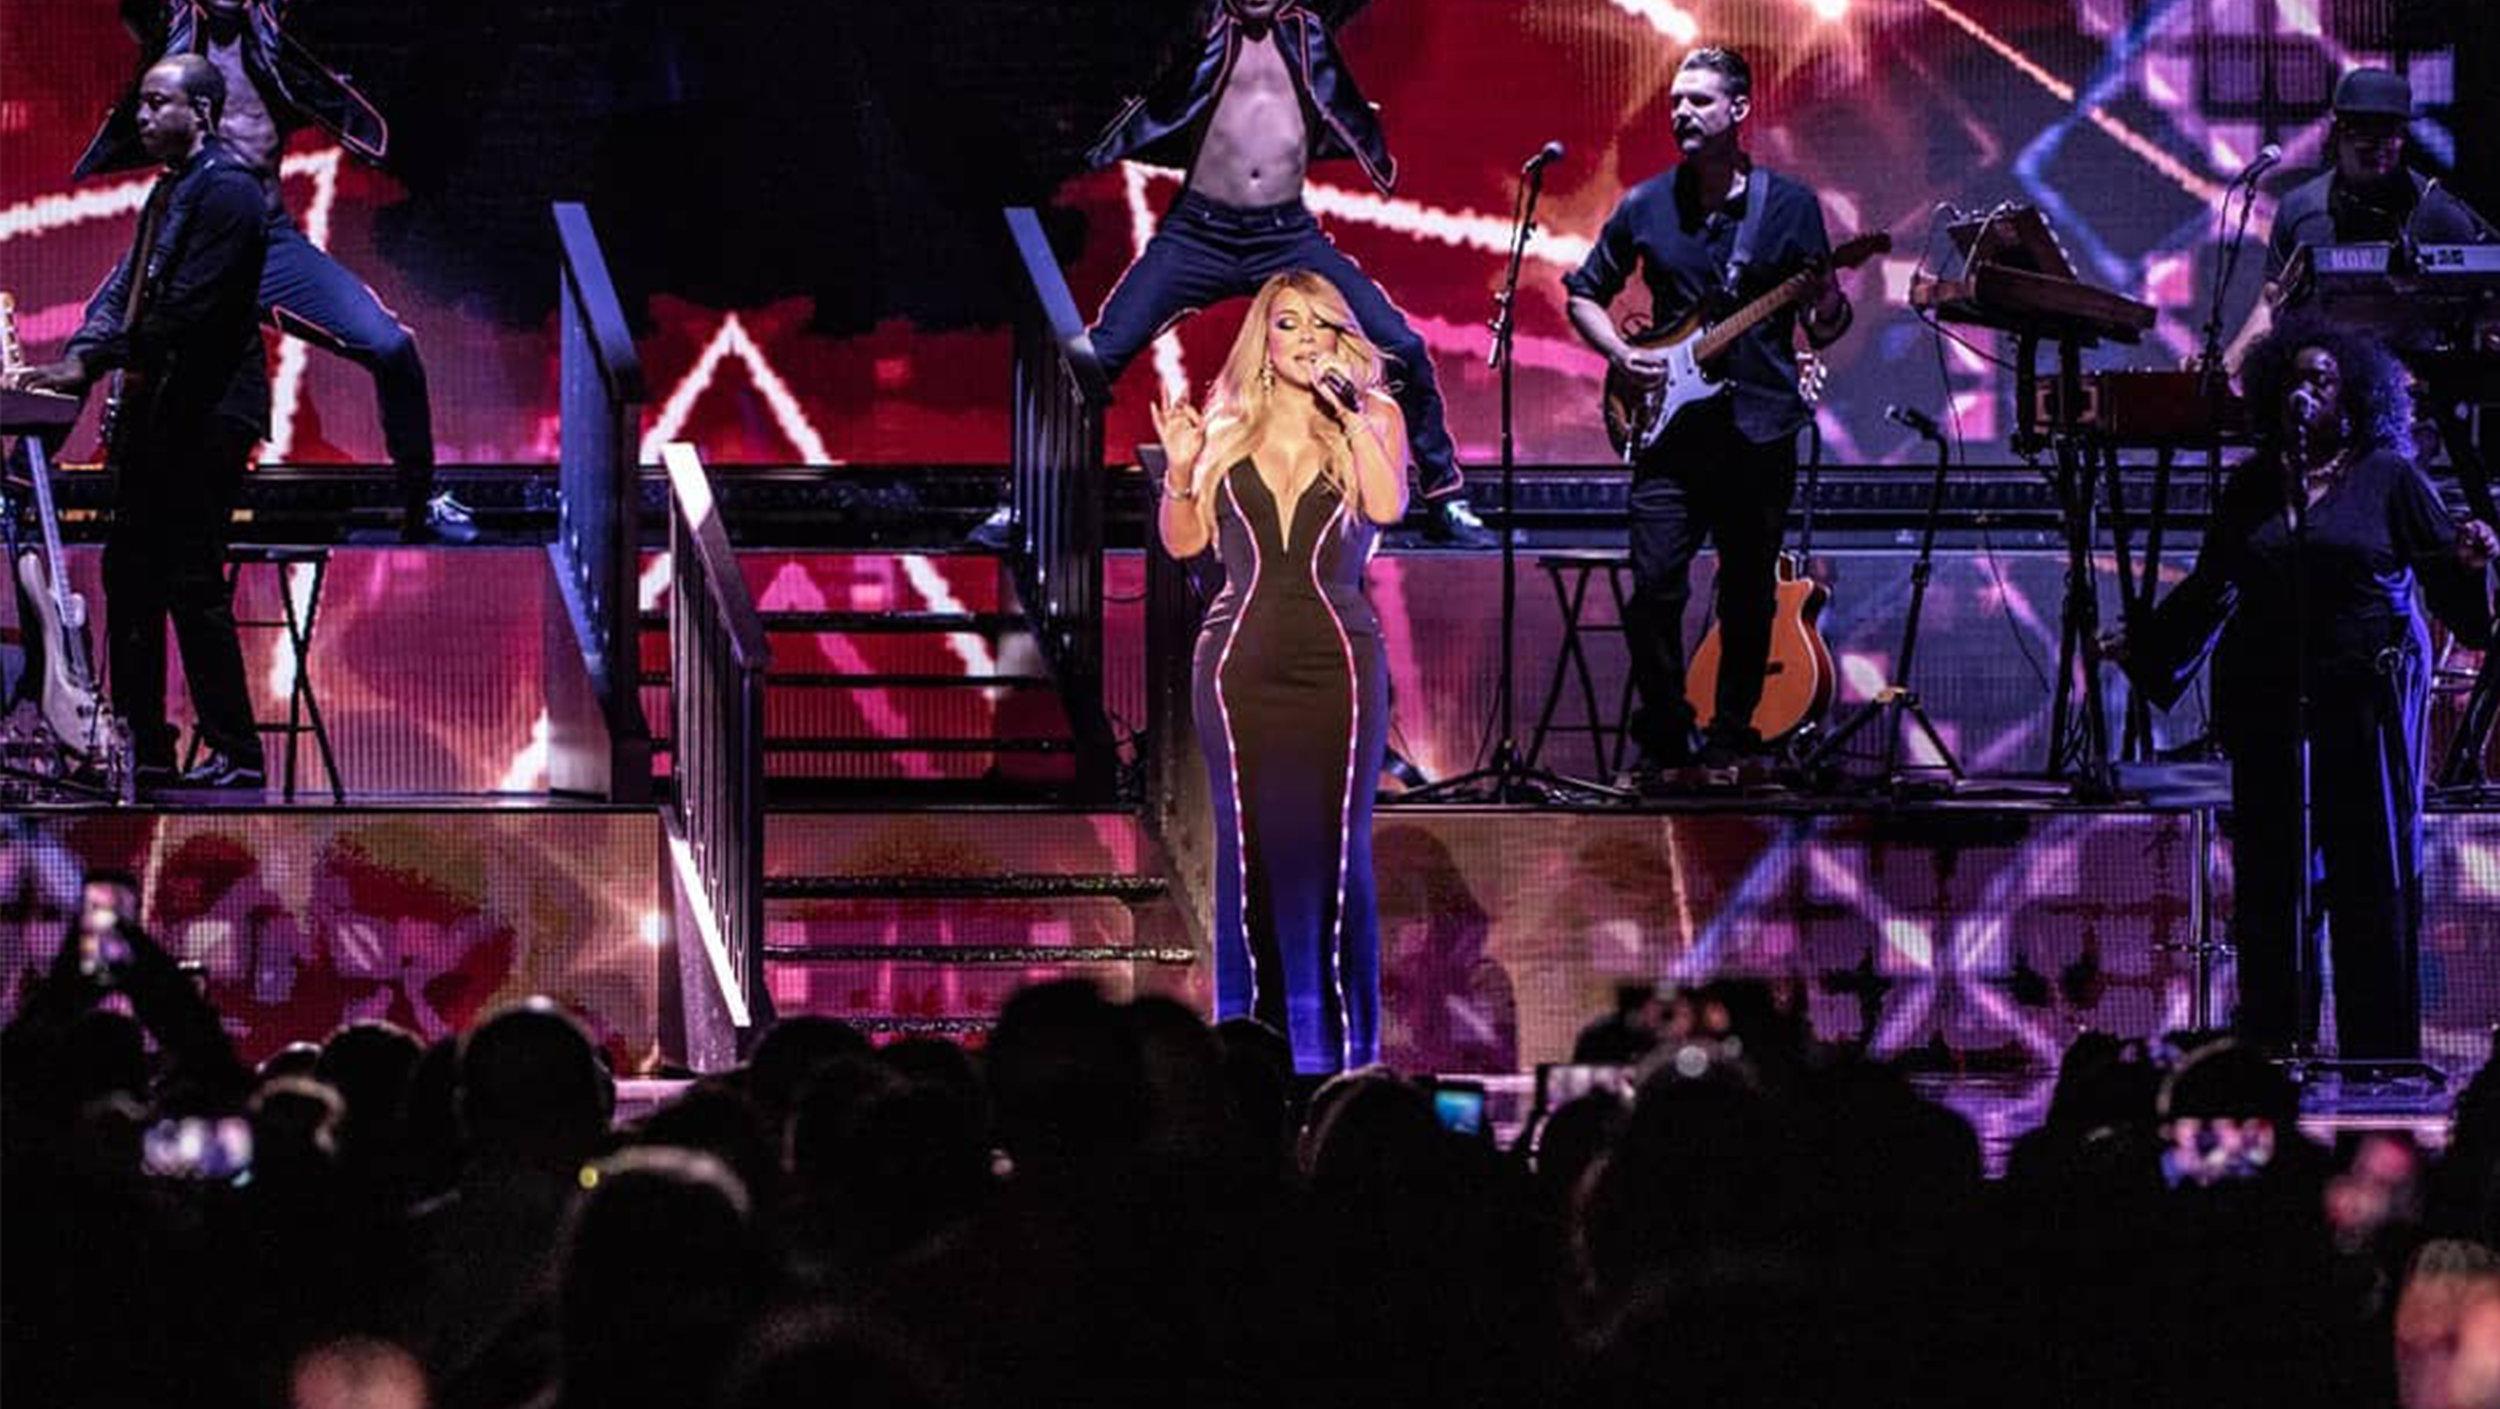 Mariah-Carey-Caution-Tour_hero.jpg